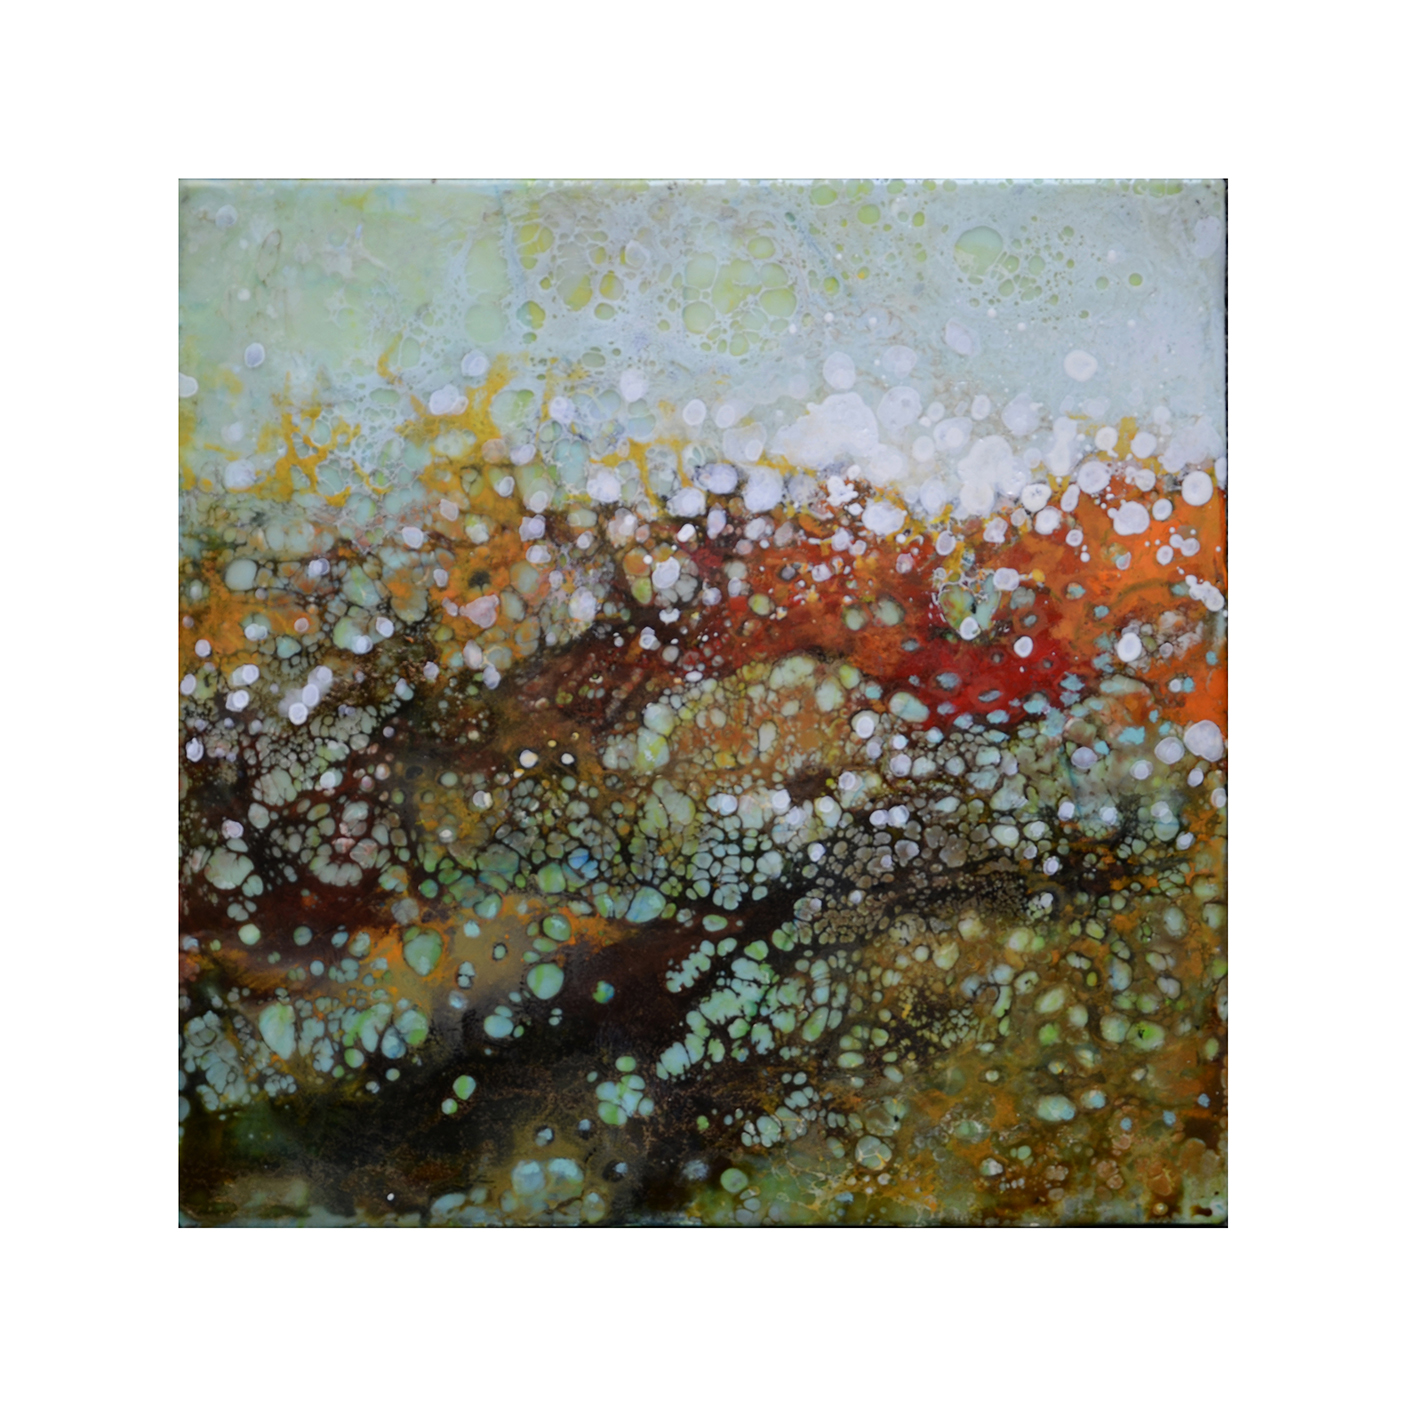 Effervescent Landscape 4   12 x 12  Encaustic on Panel  $300